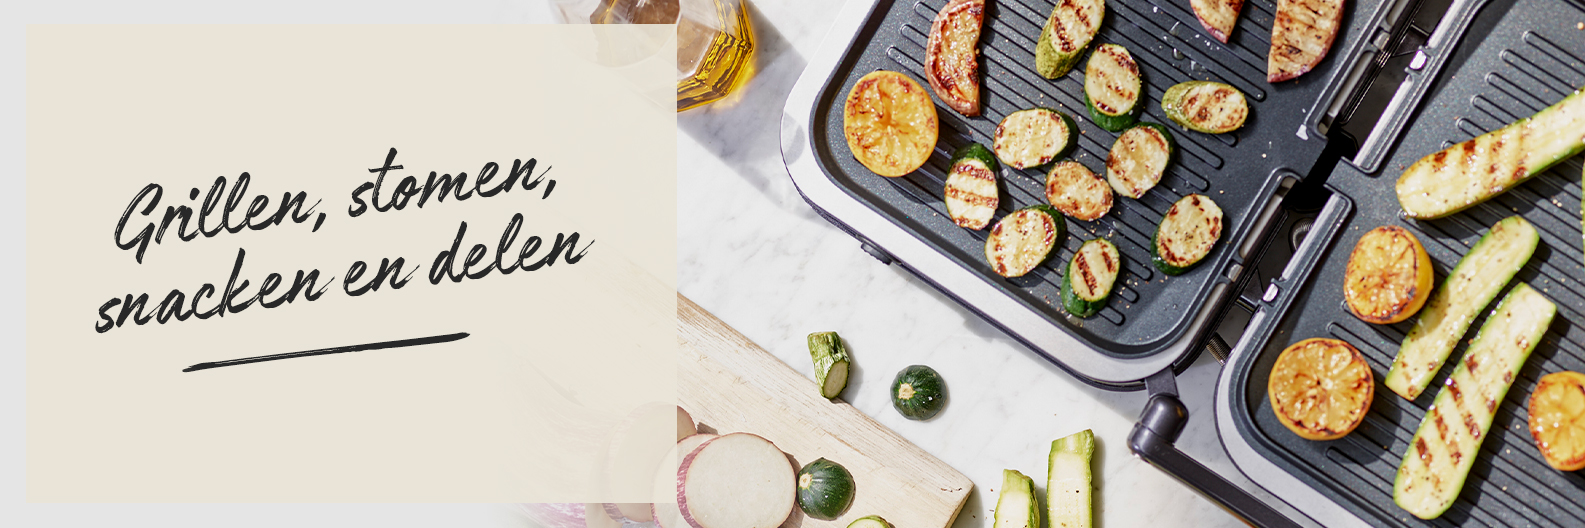 Koken - Cuisinart